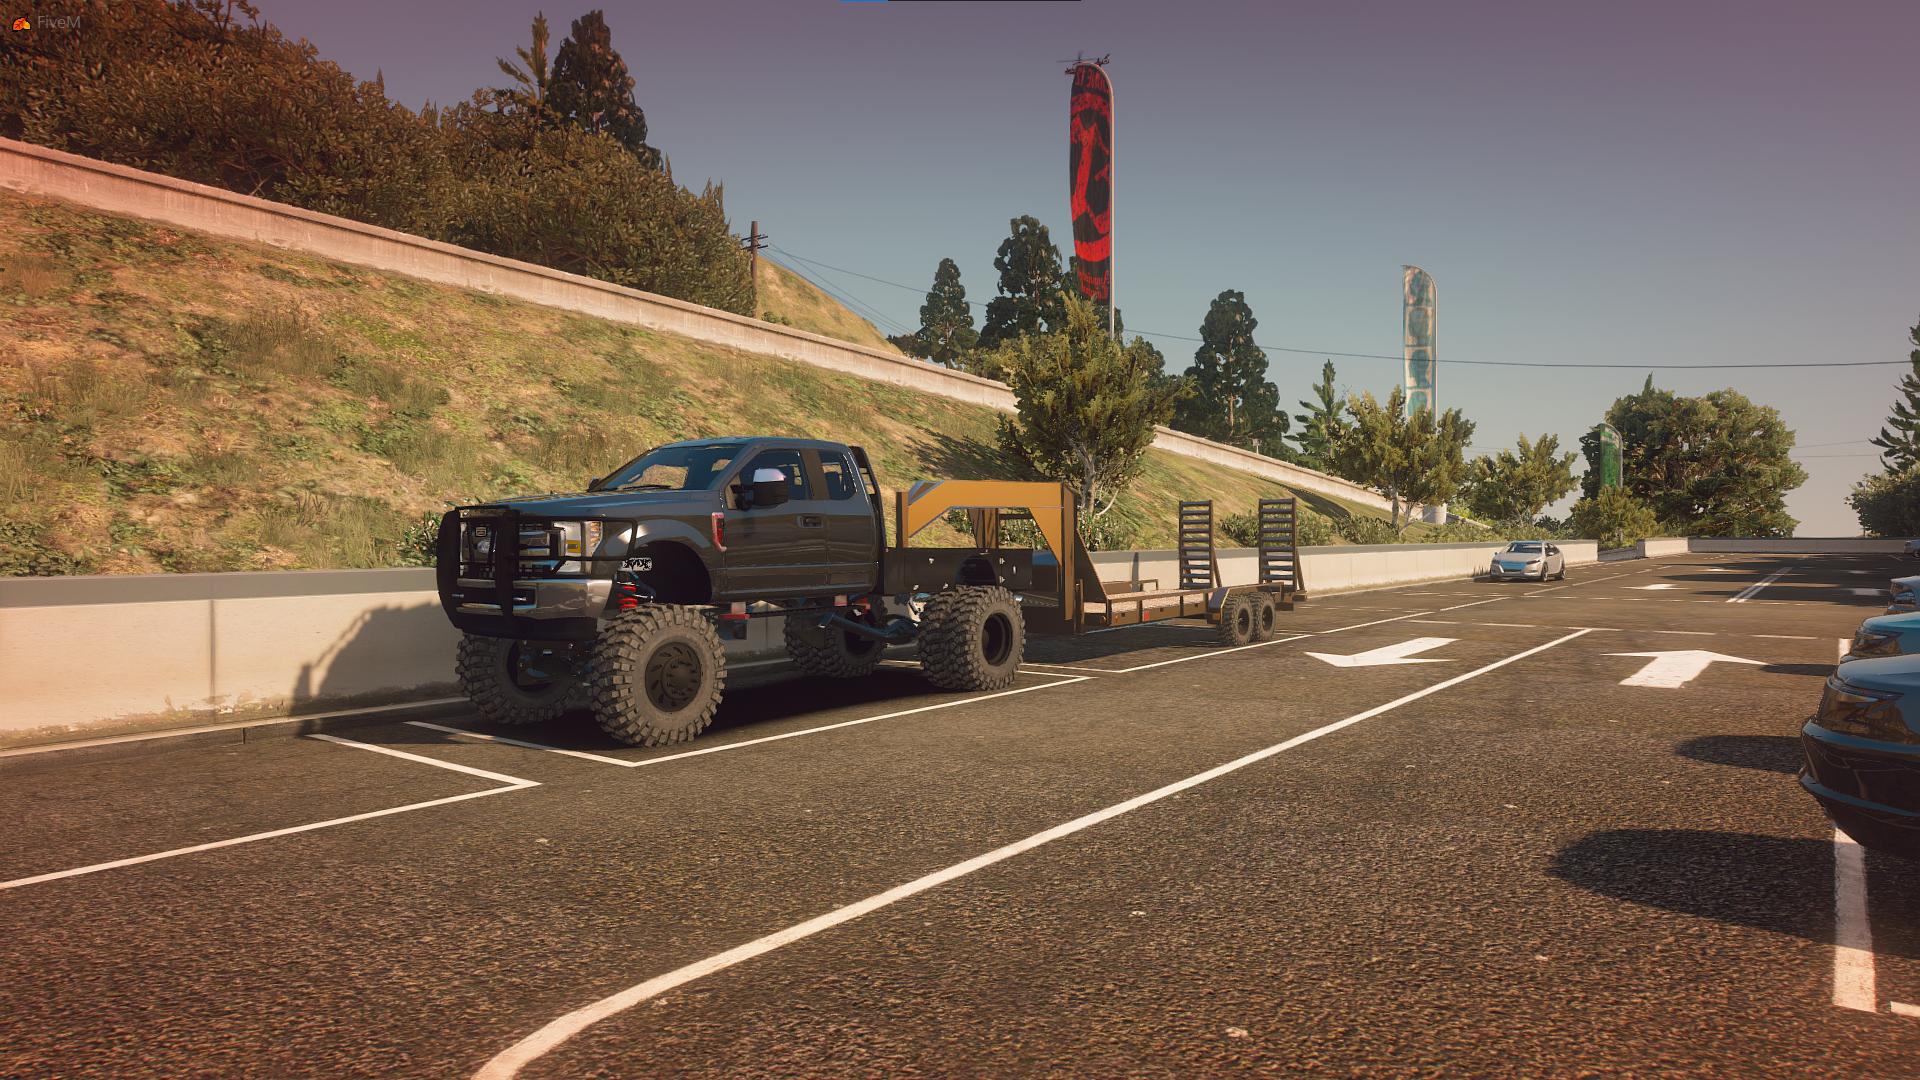 Offroad Truck & Trailer